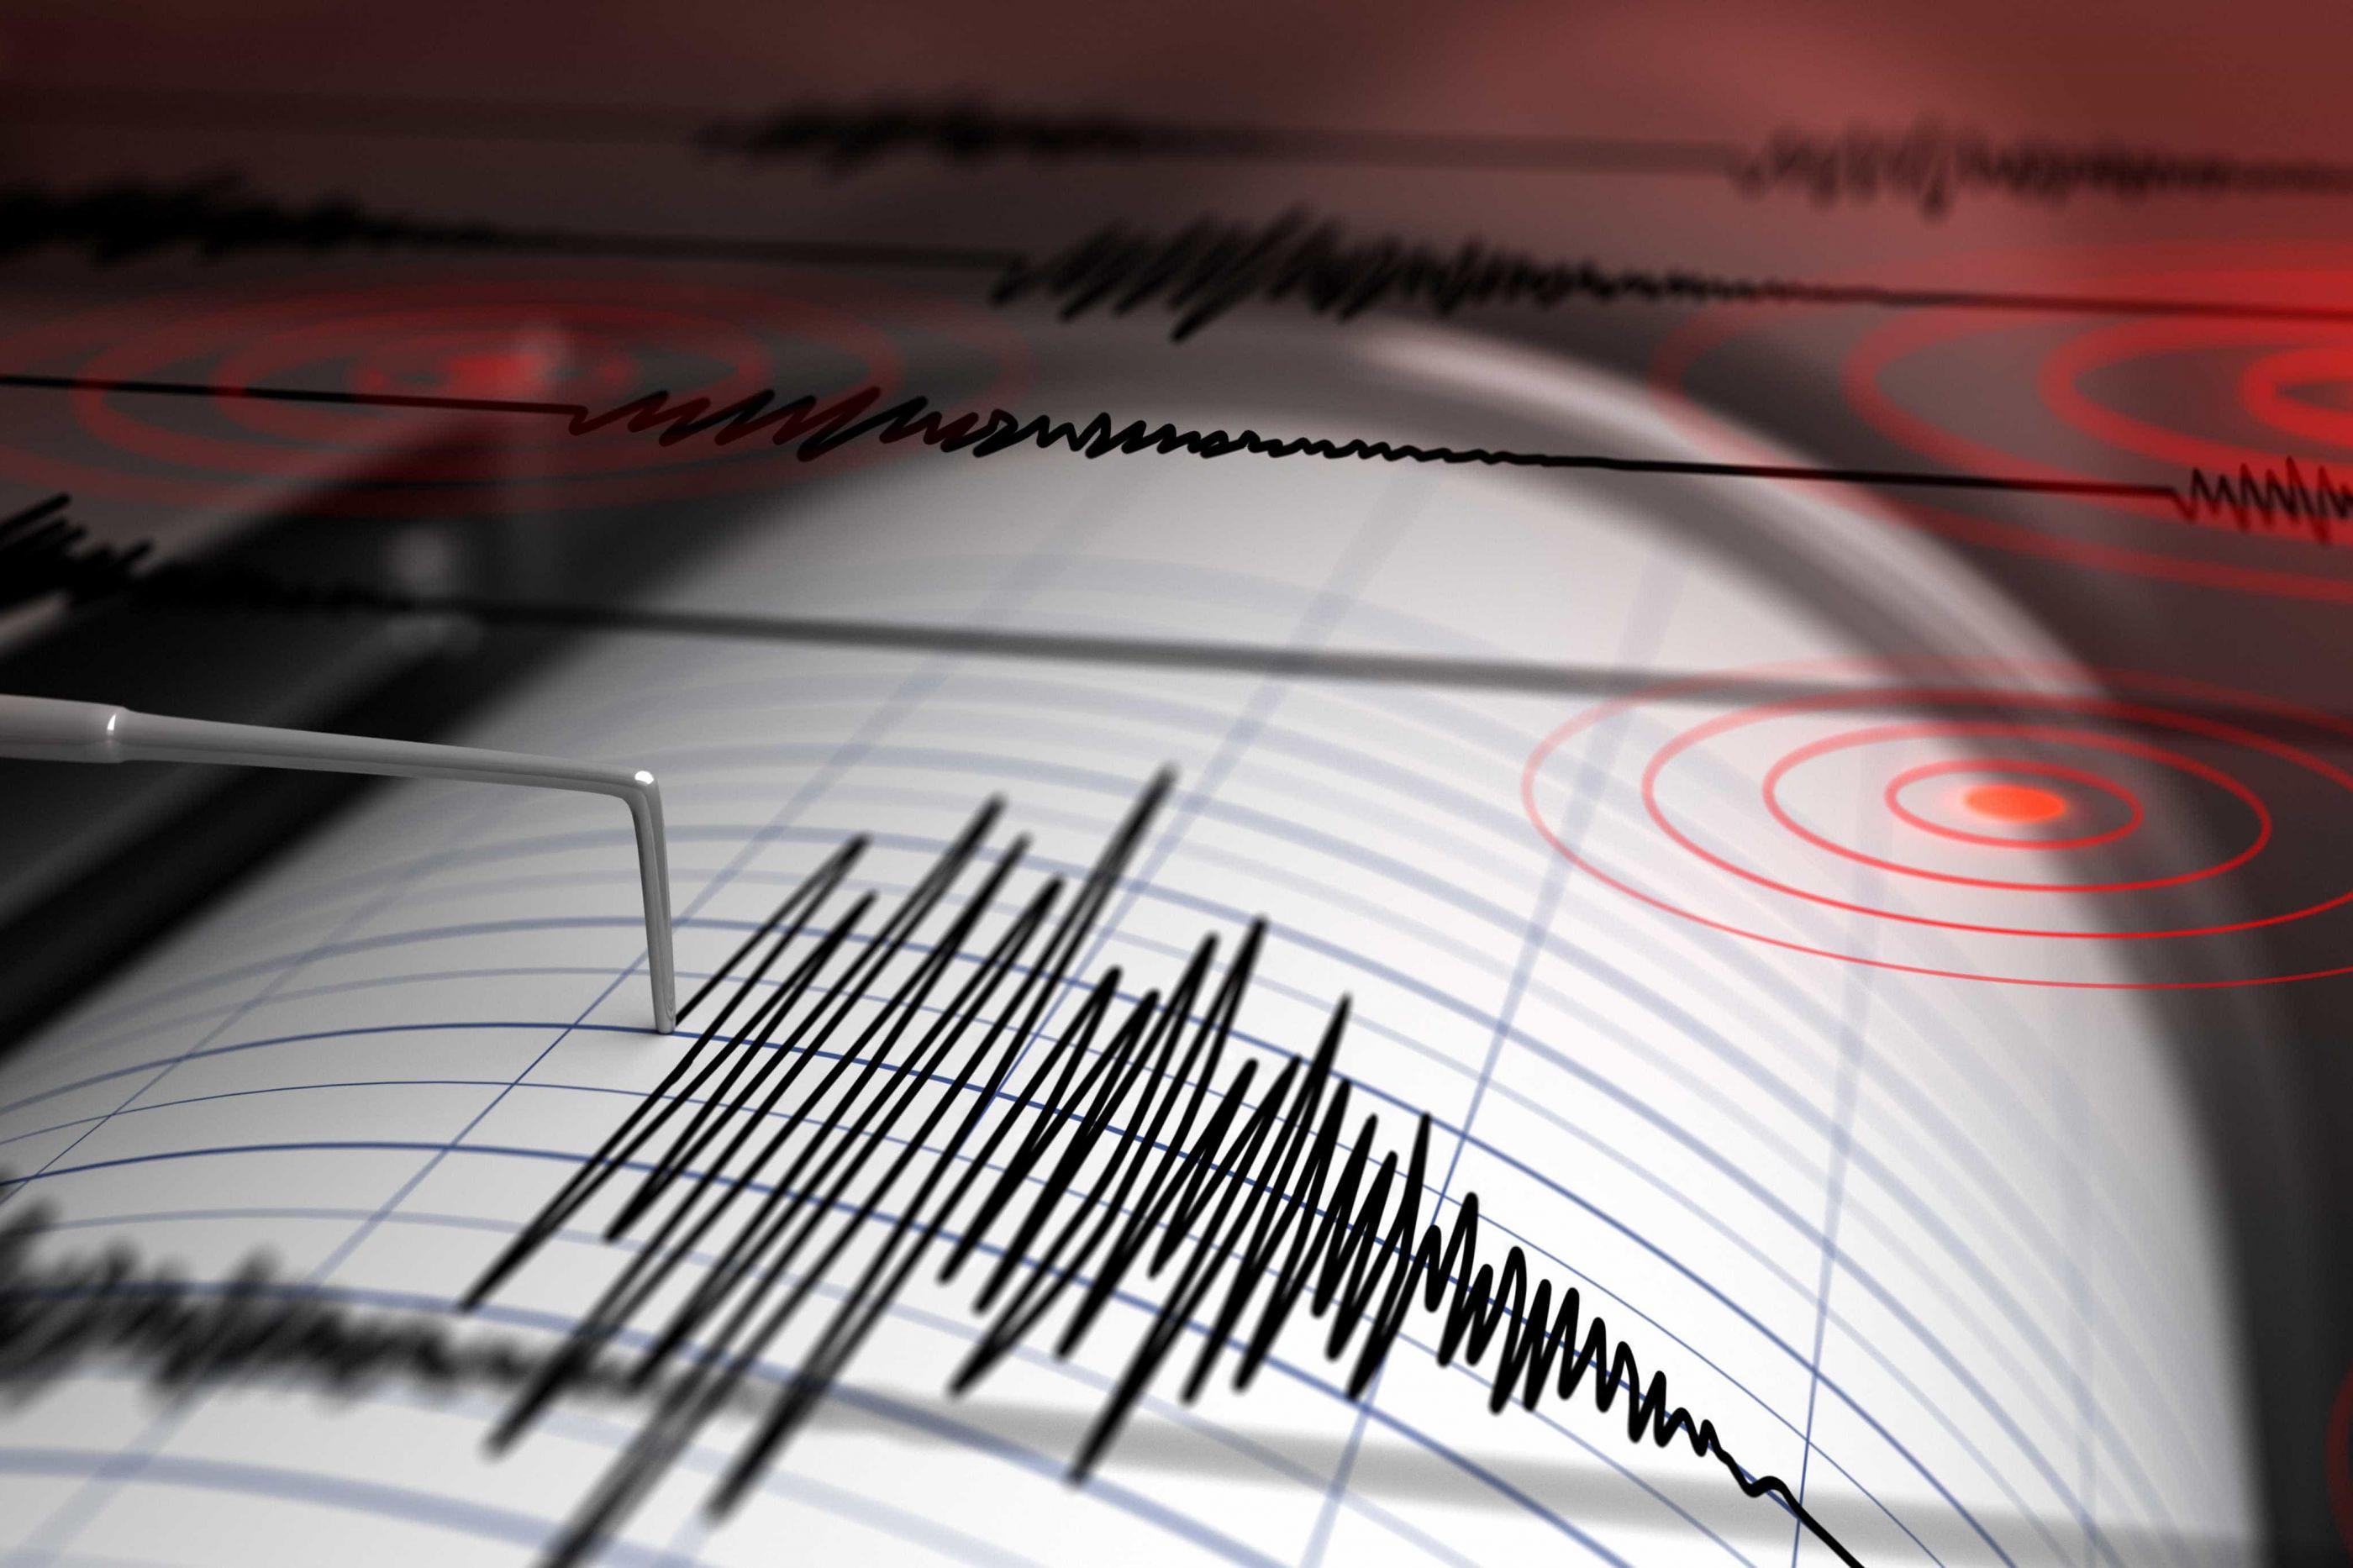 Sismo de magnitude 6,1 atinge norte da Indonésia